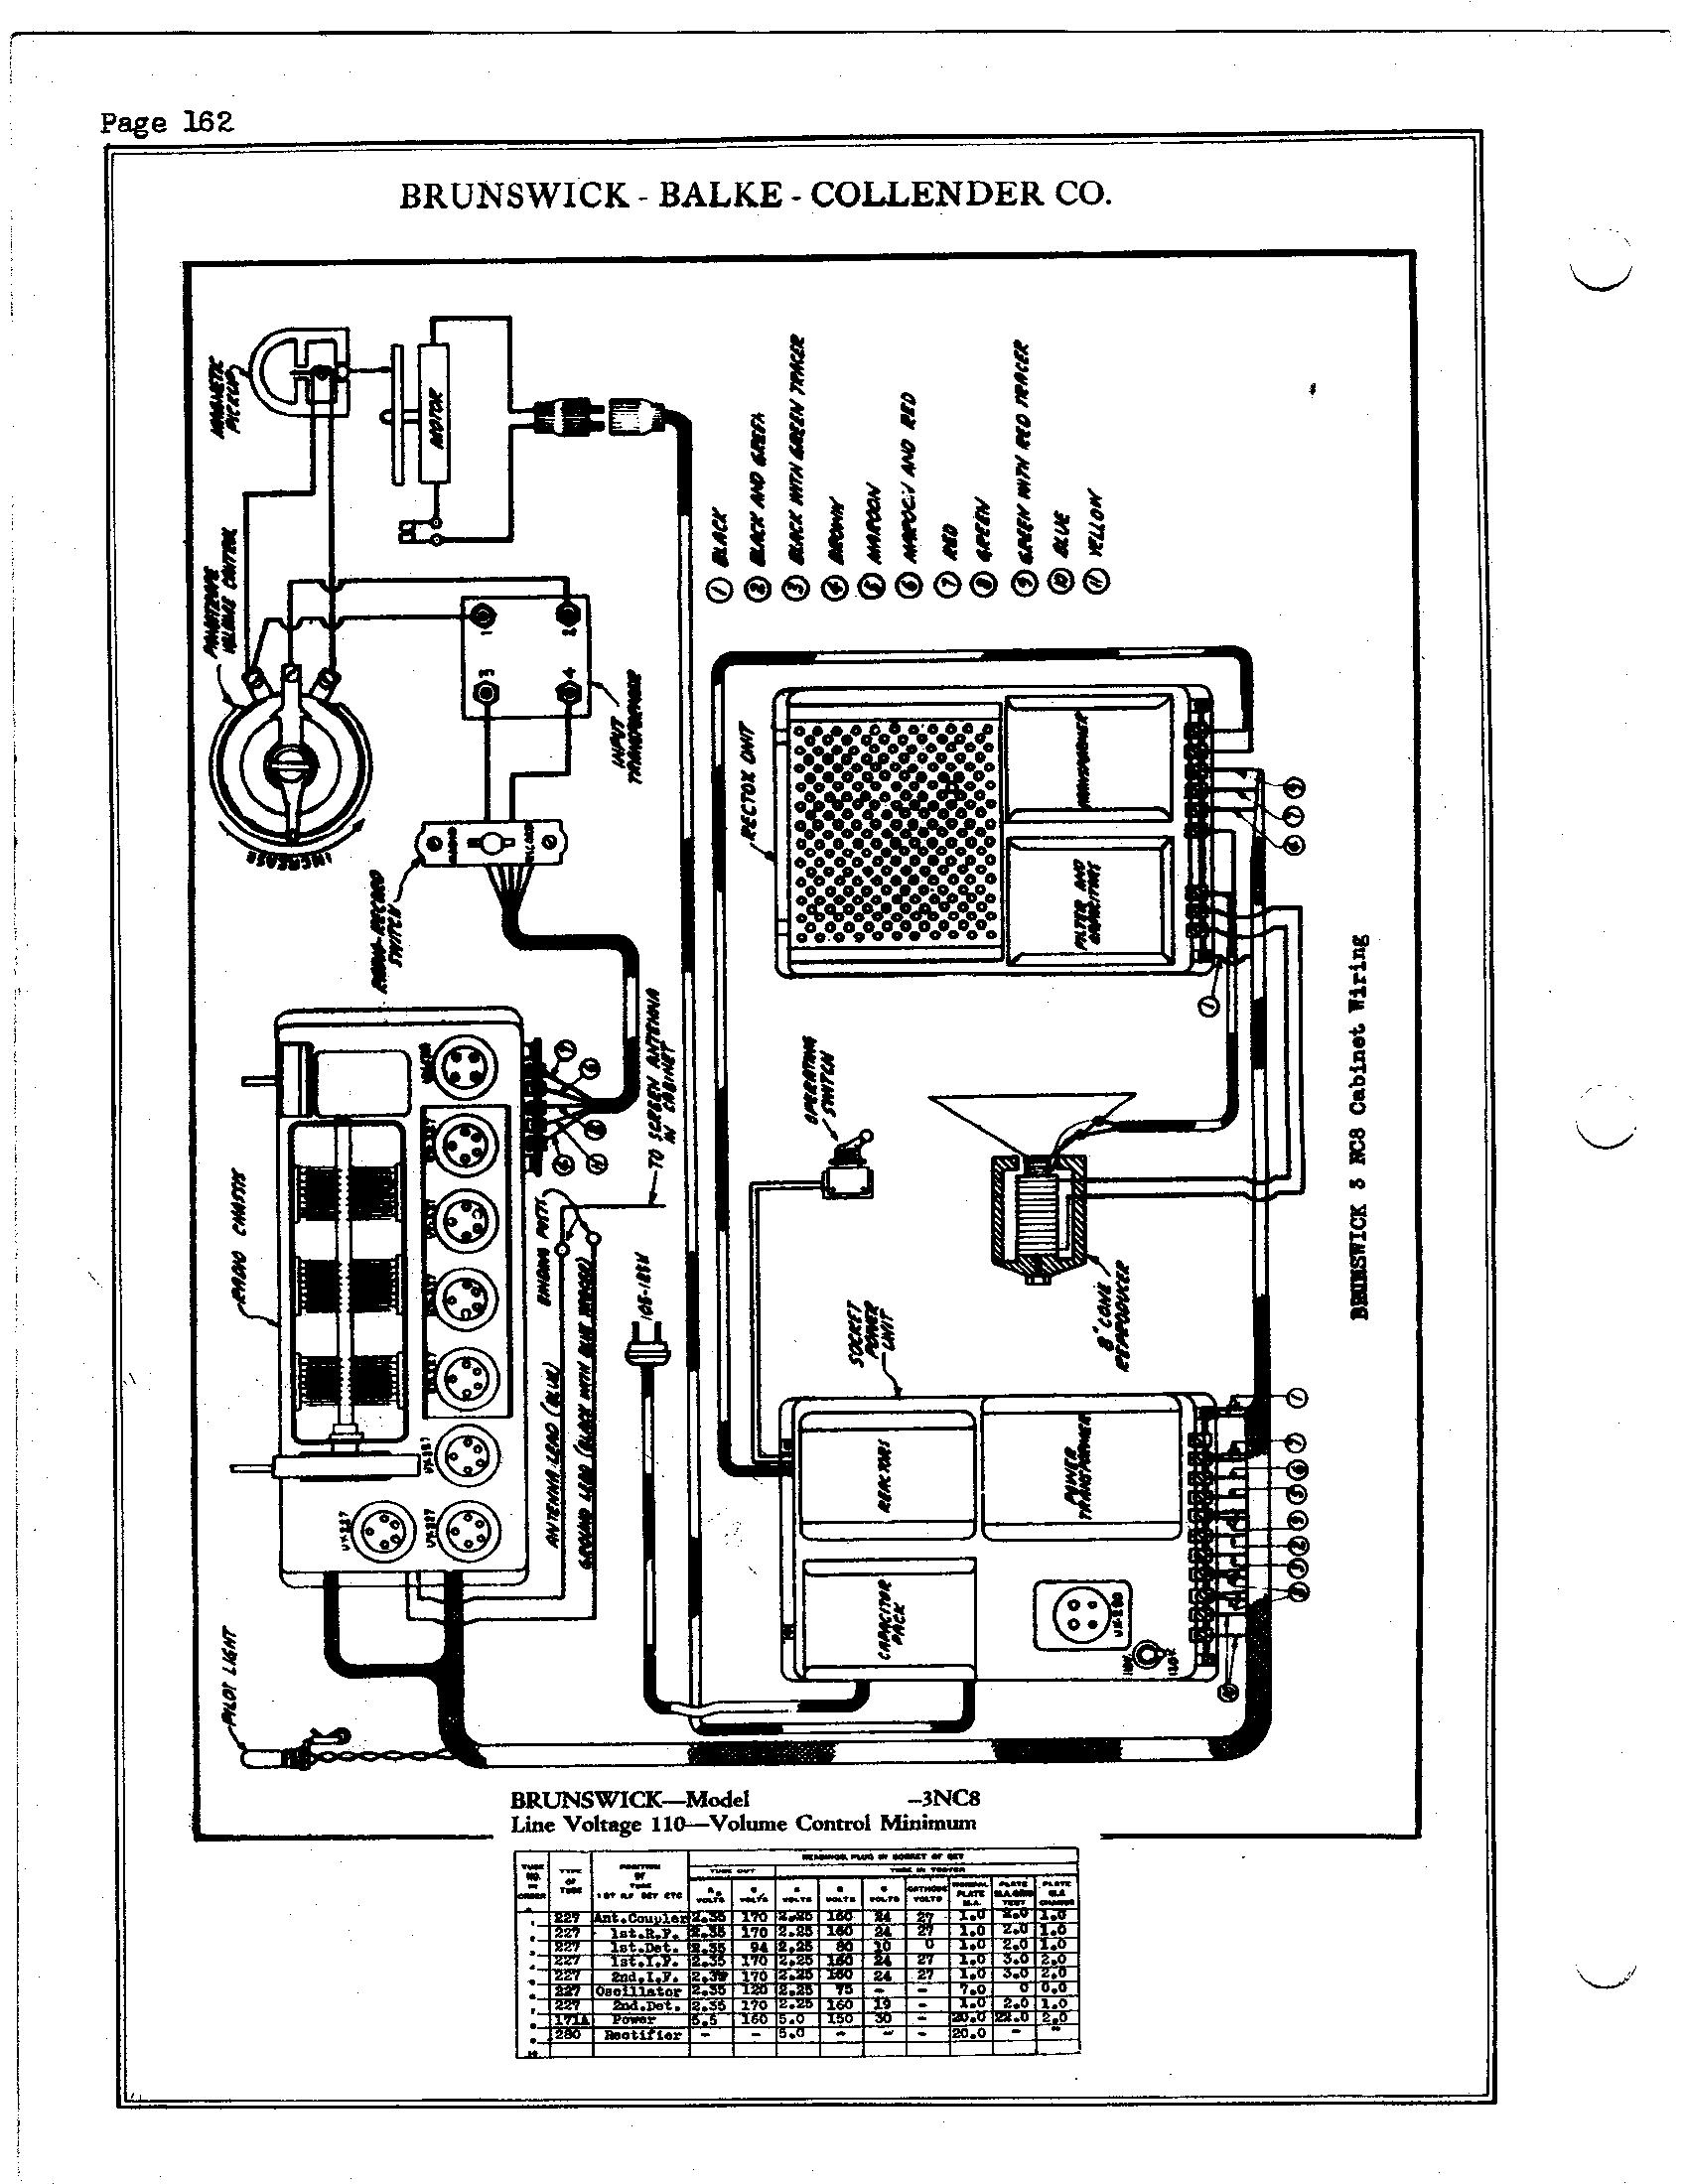 [DIAGRAM_38YU]  Brunswick-Balke-Collender 5 NC8 | Antique Electronic Supply | Brunswick Model A Wiring Diagram |  | Antique Electronic Supply